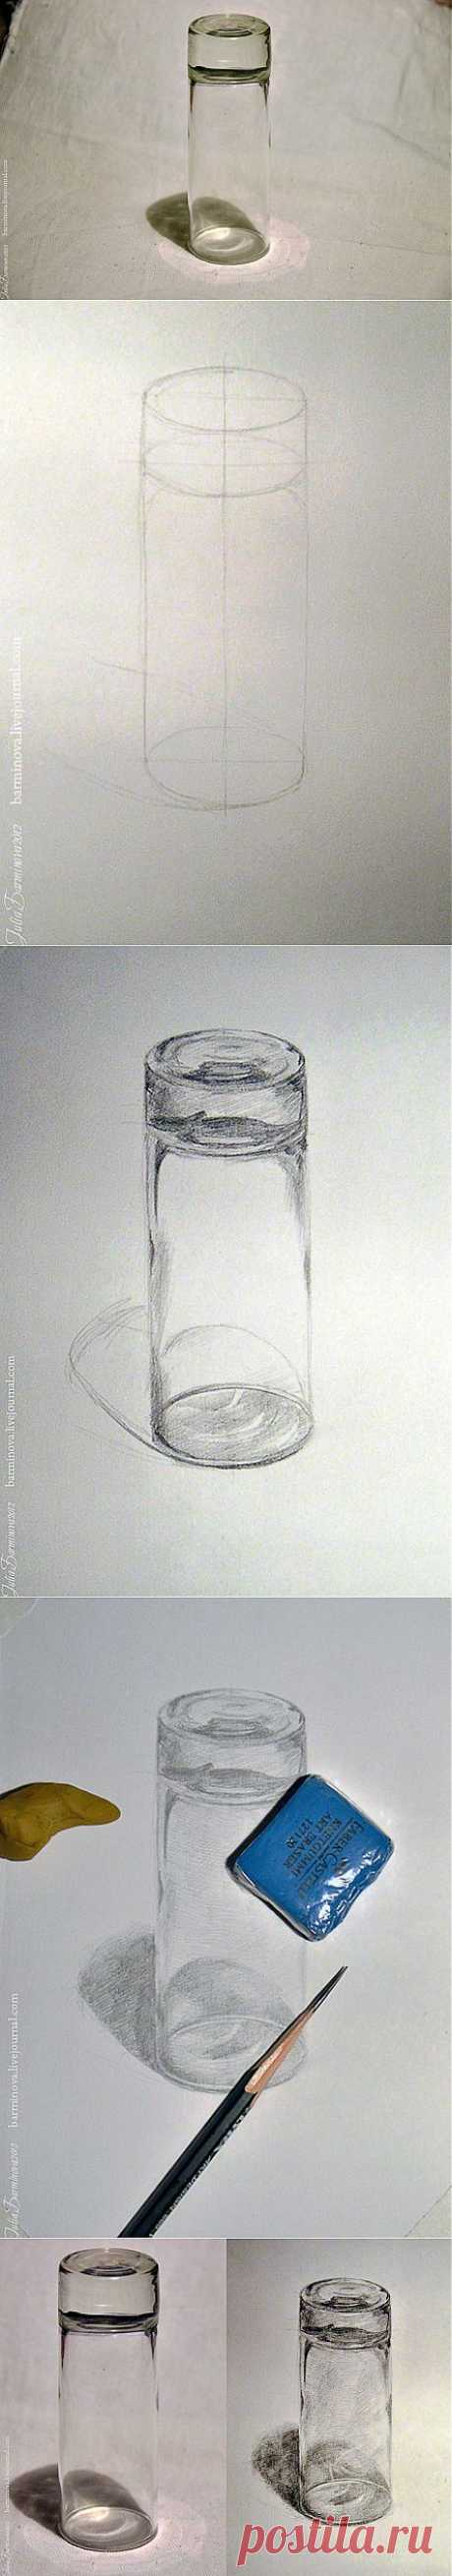 impressions, inspiration, aquarelle - Рисуем стекло